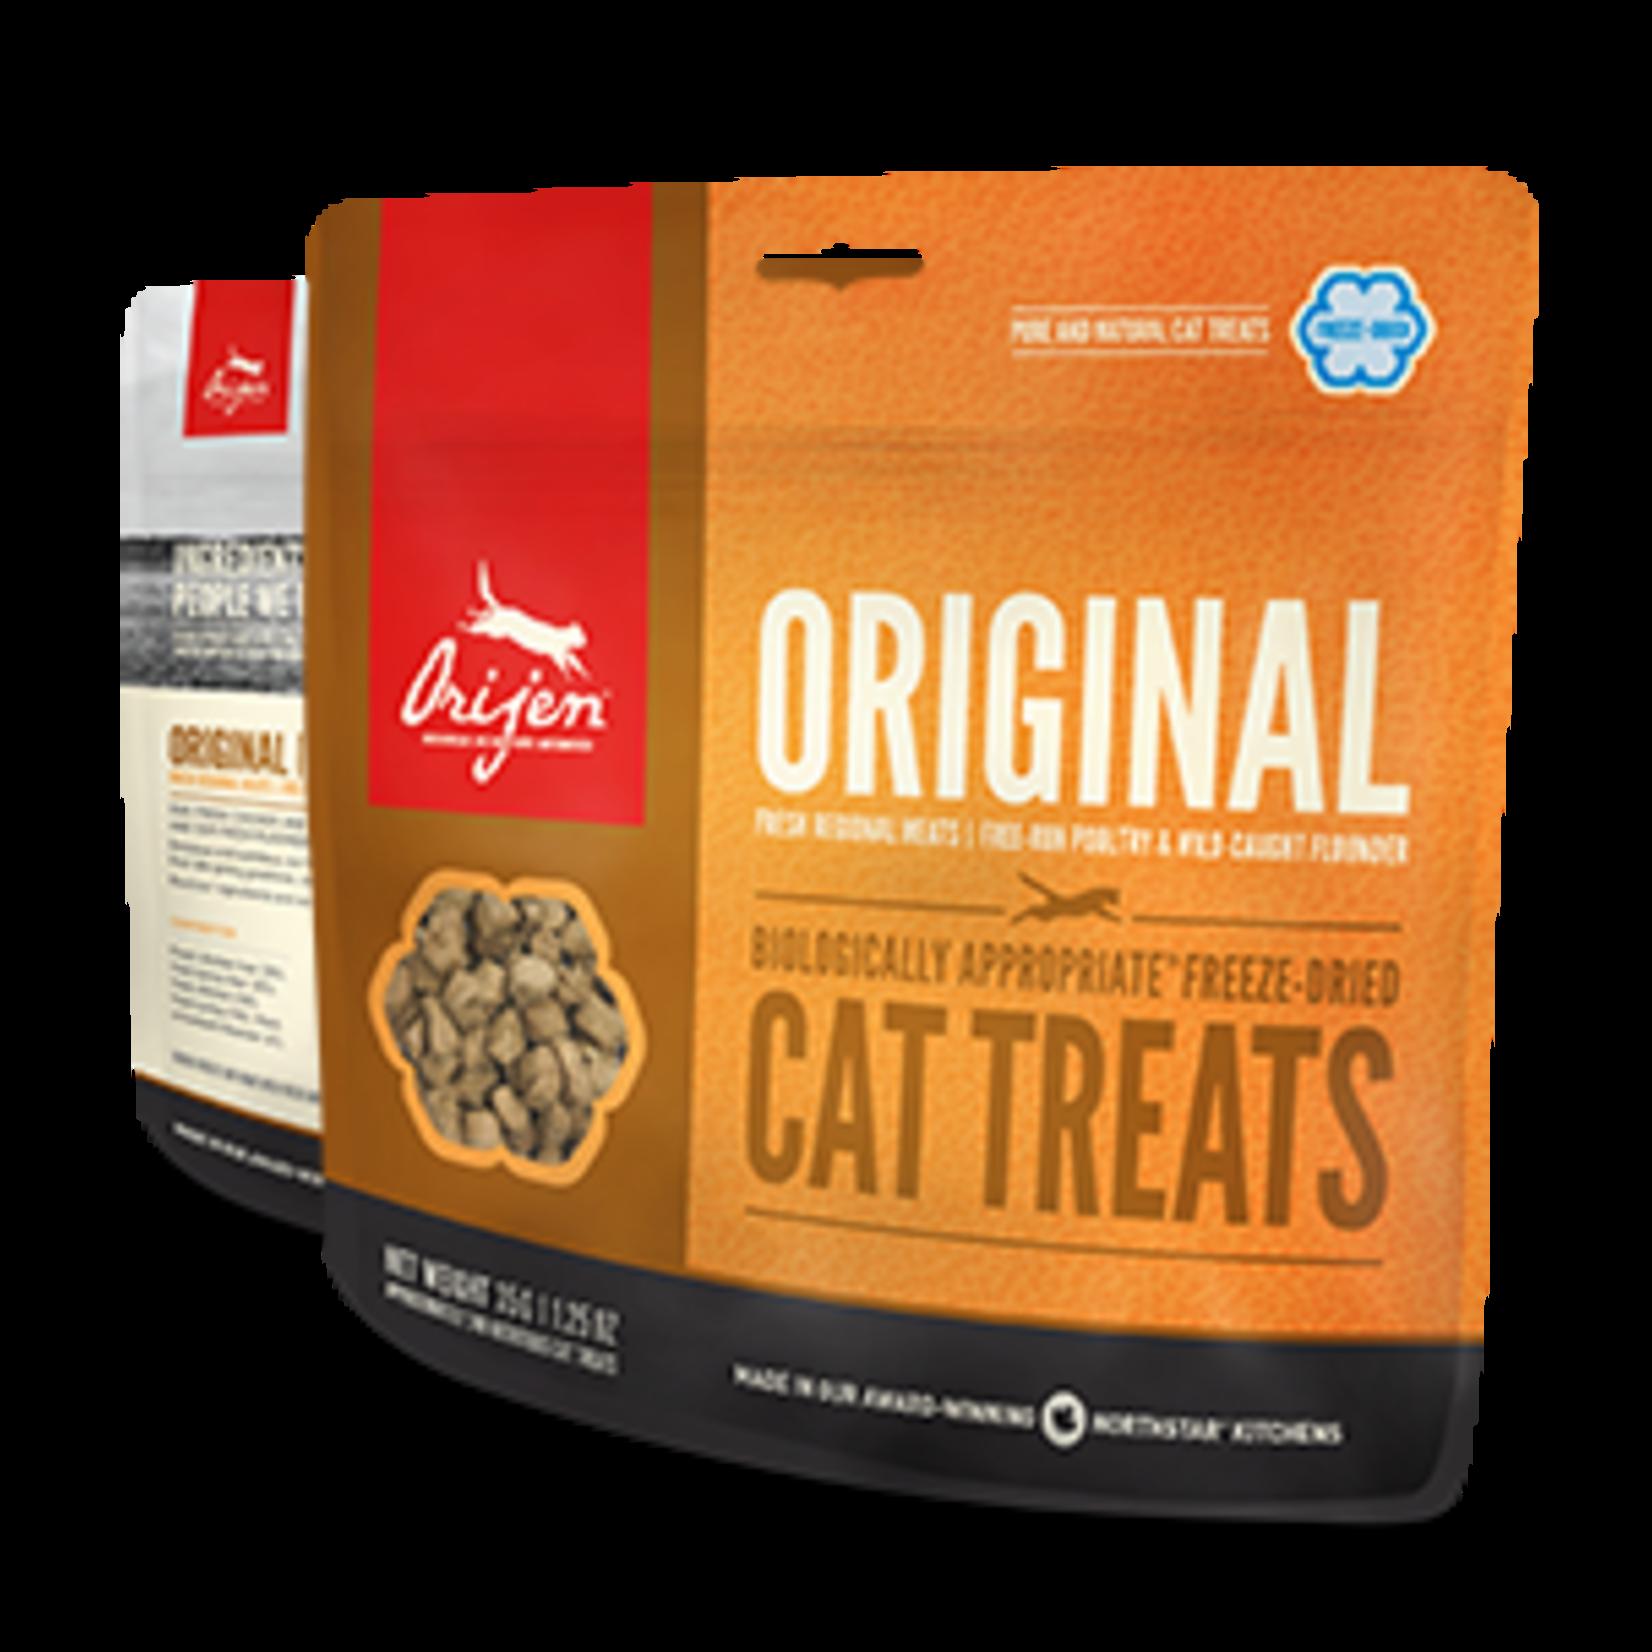 Orijen Orijen Original Cat Treat 1.25oz